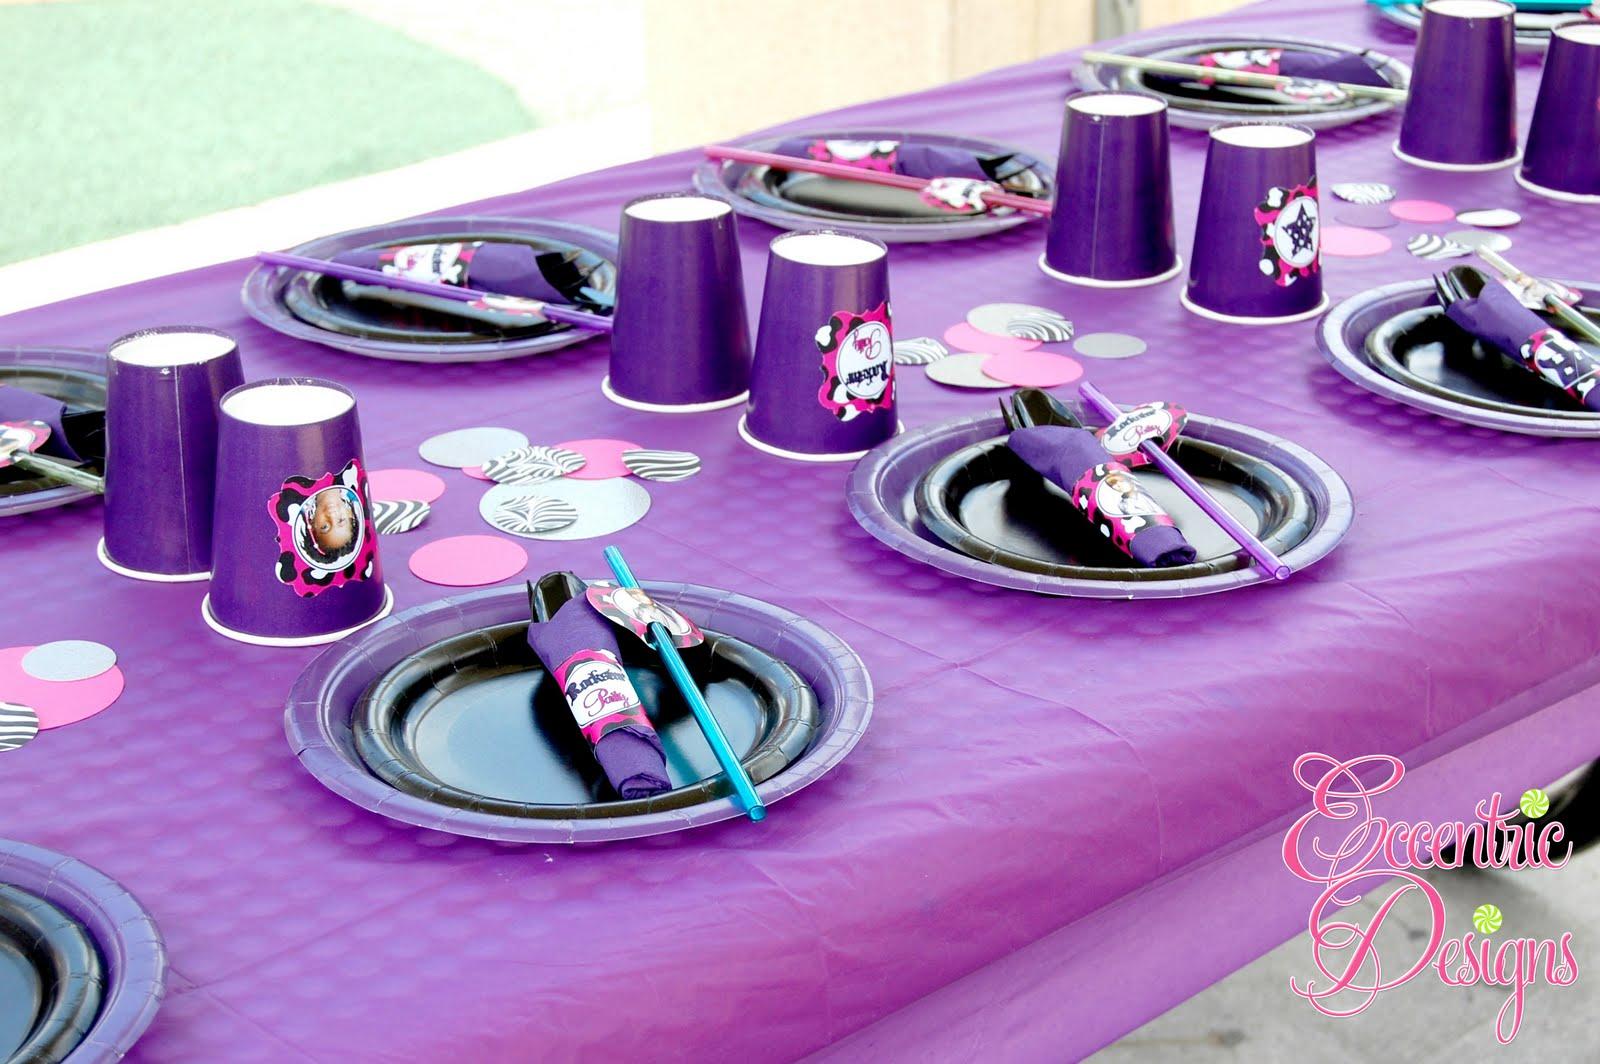 Eccentric Designs By Latisha Horton Real Party